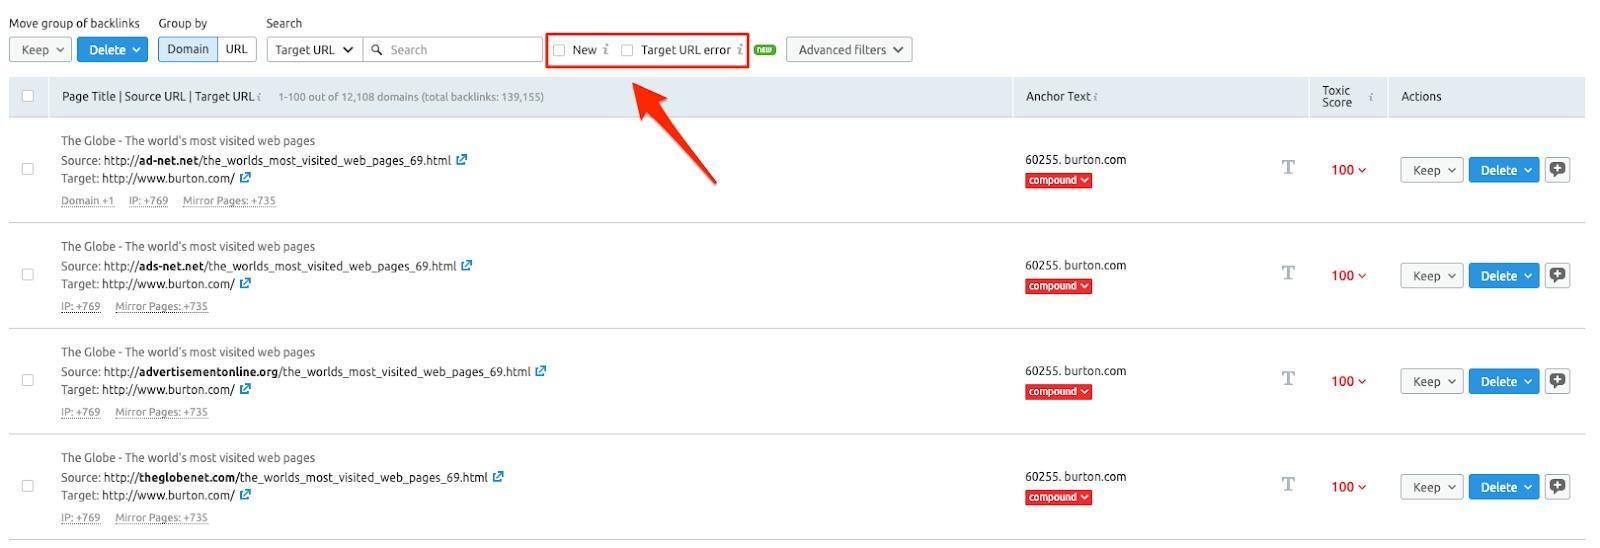 Cómo auditar tus backlinks image 5